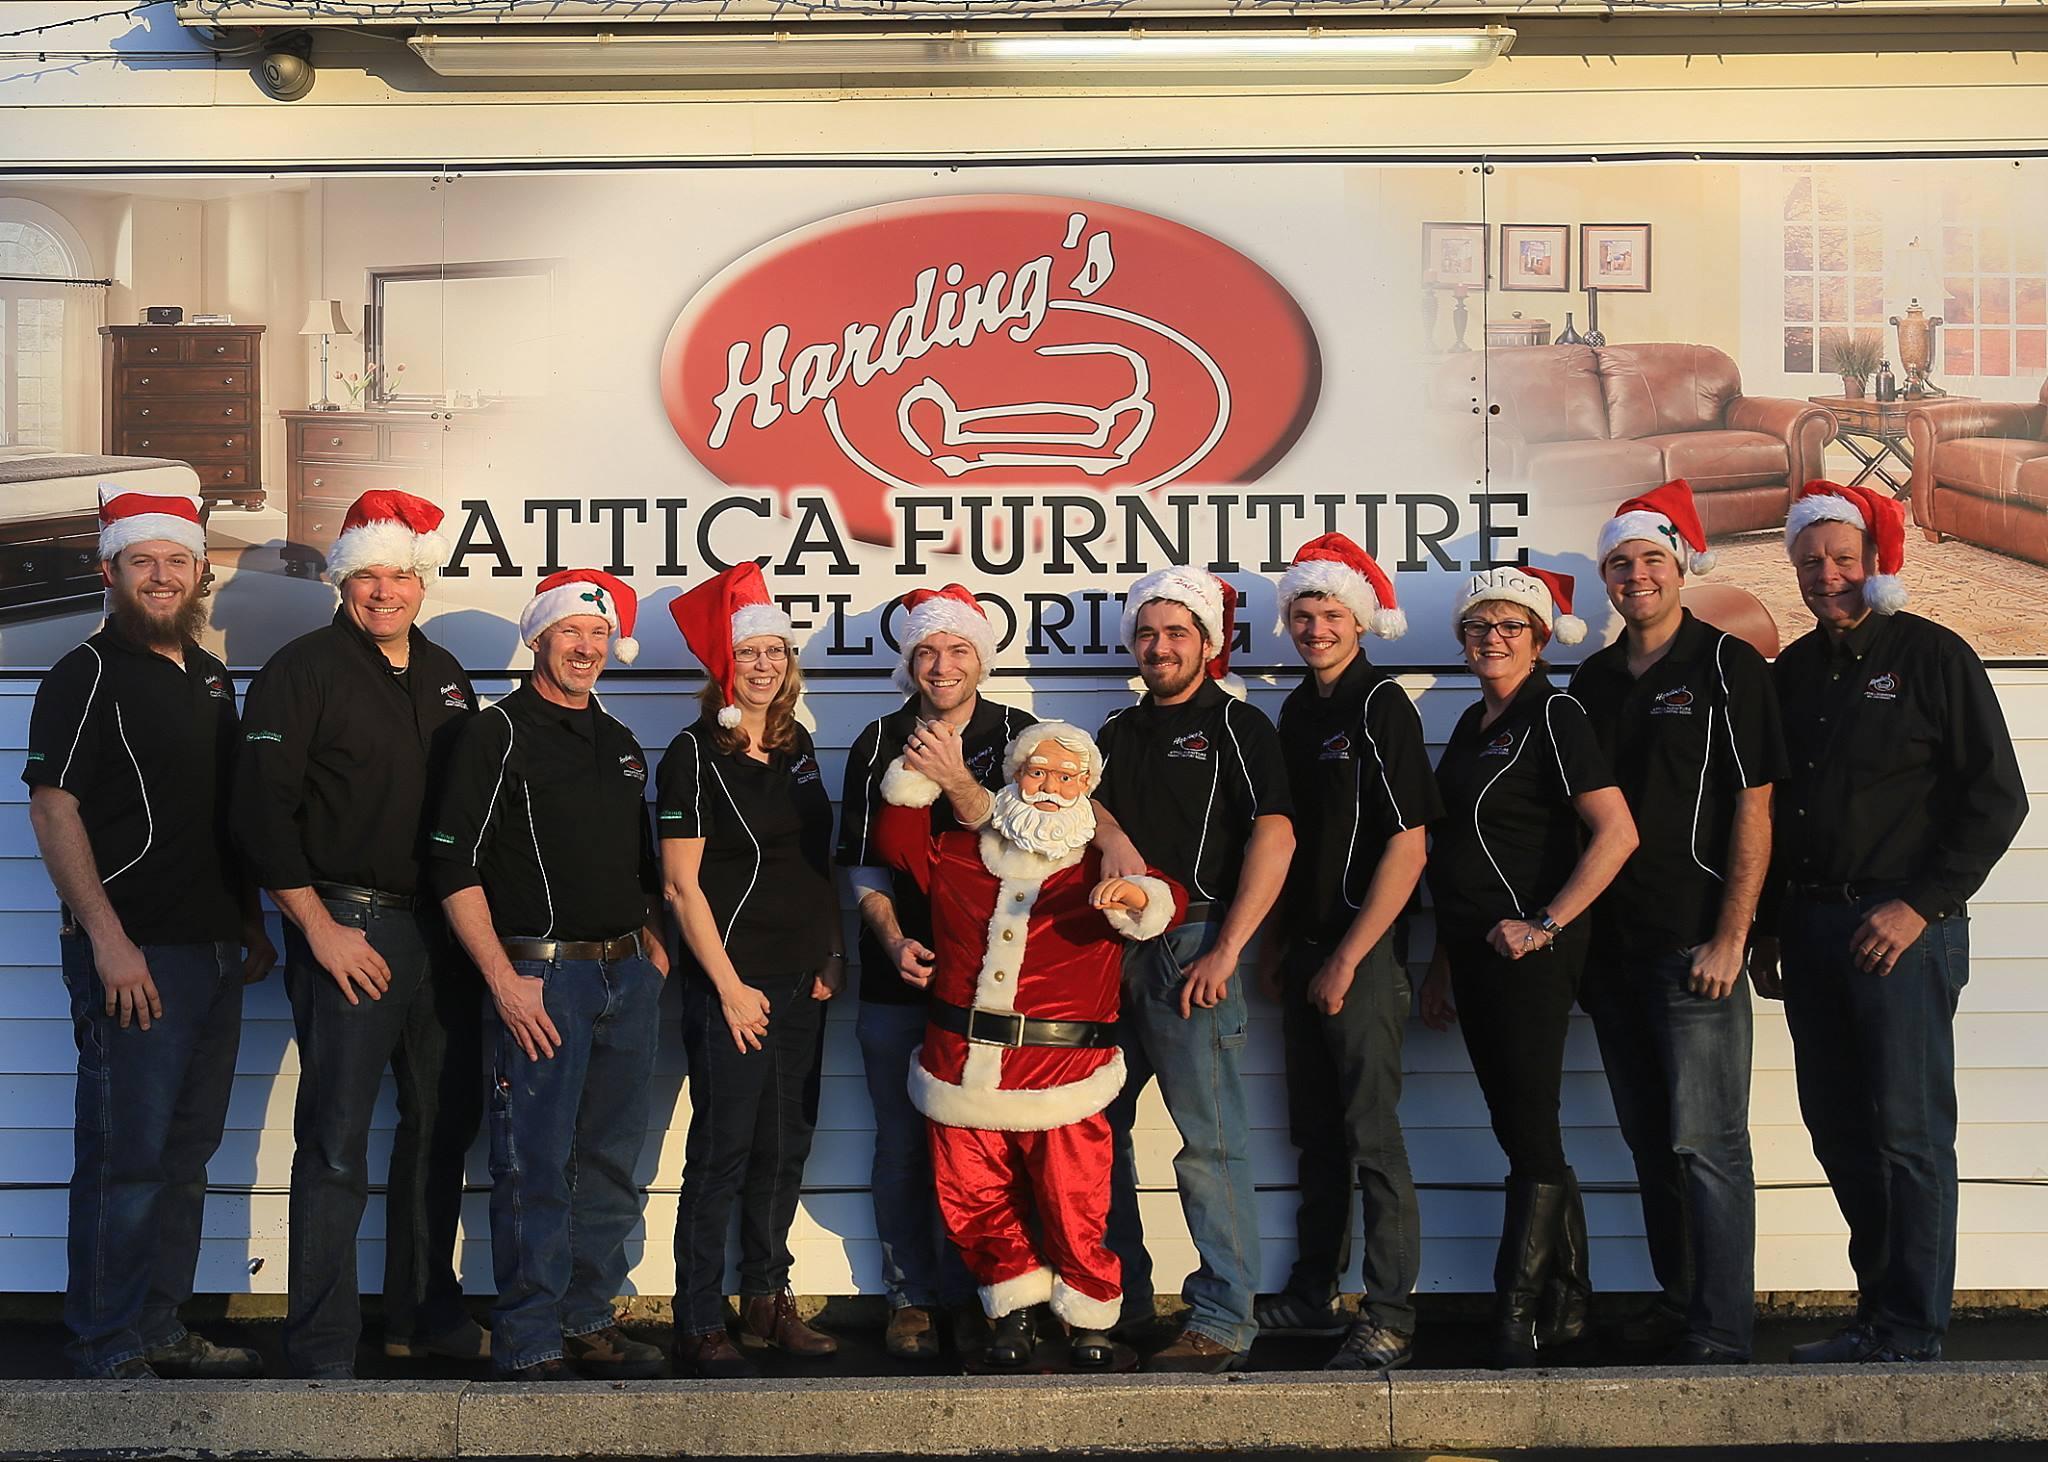 Harding'S Attica Furniture And Flooring – Natural Vita Talalay Latex Mattress Store In Attica New York